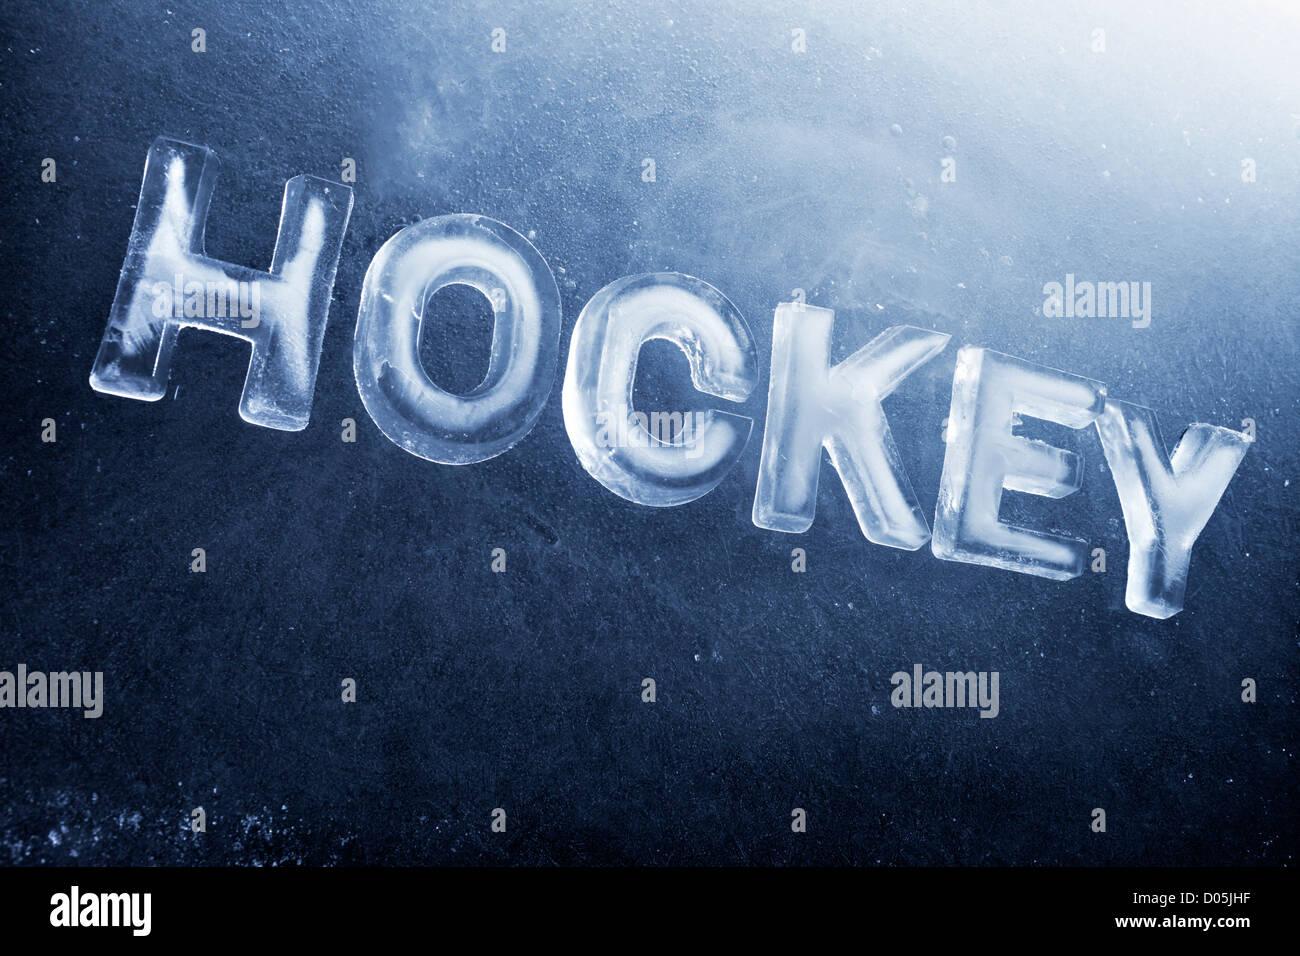 Palabra hockey hielo real escrito con letras. Imagen De Stock